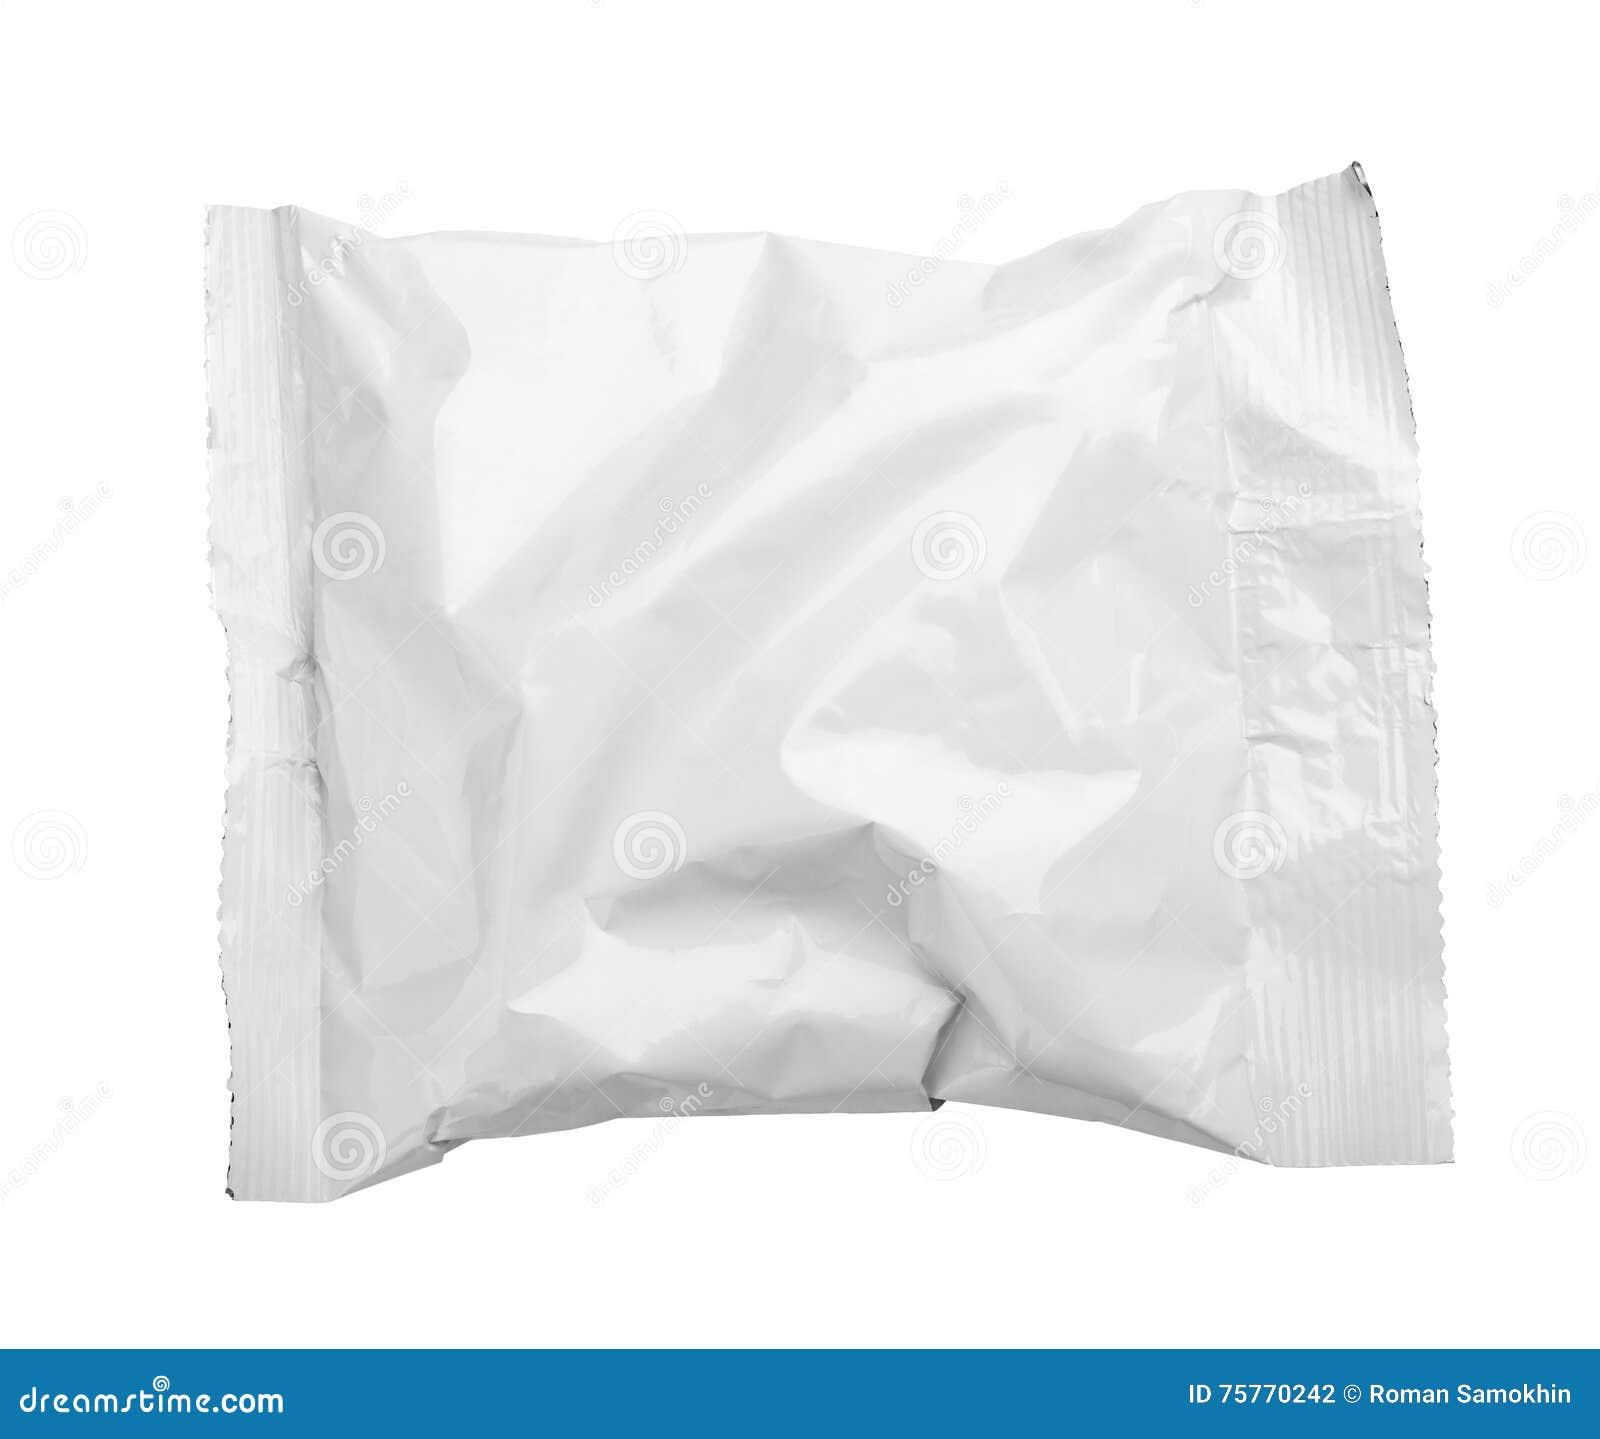 A ideia superior do empacotamento de alimento amarrotado placa do malote plástico isolou-se no branco